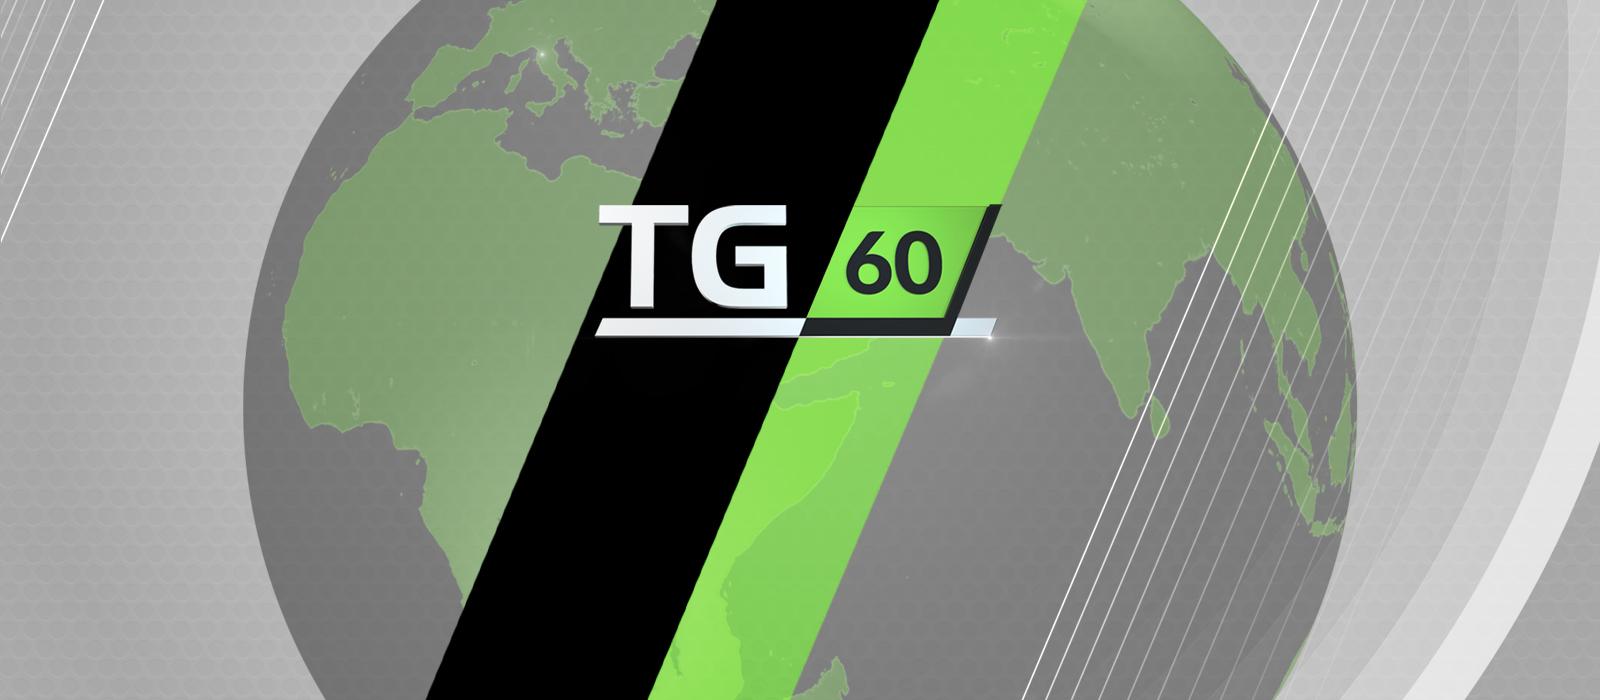 Tg 60